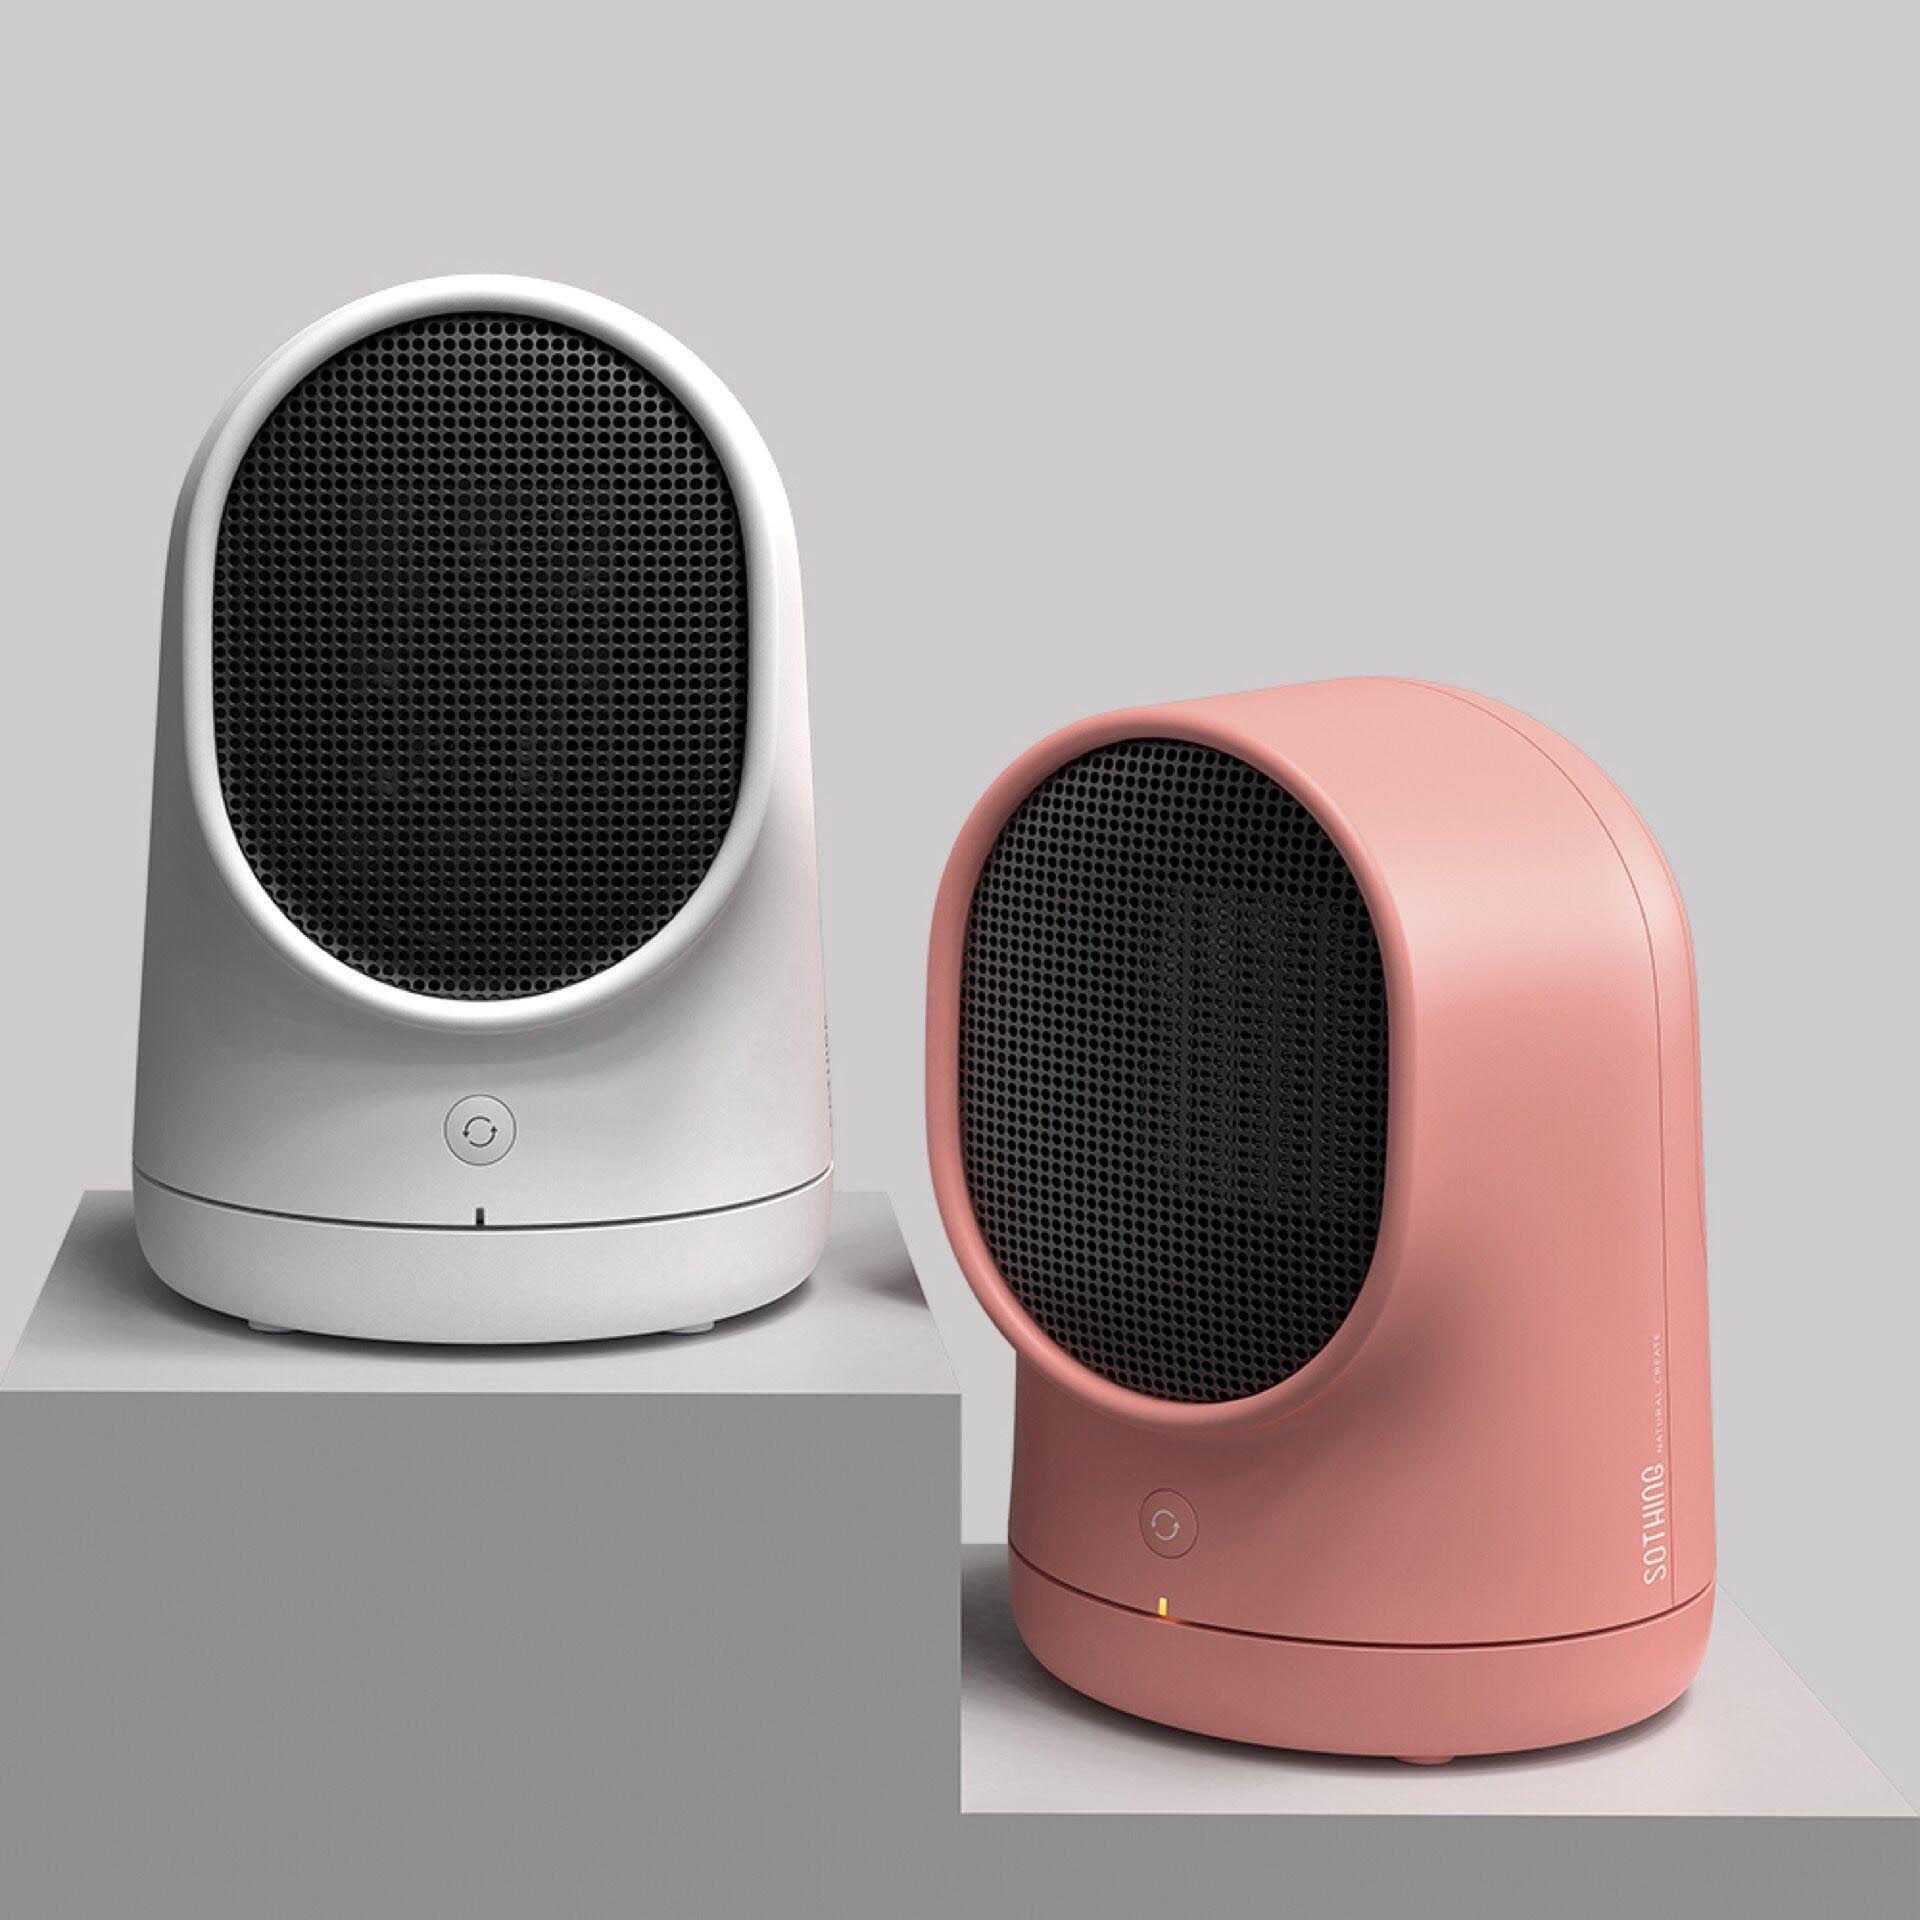 2018 220v Mini Electric Heating Desktop Heater Creative Home Gifts ...